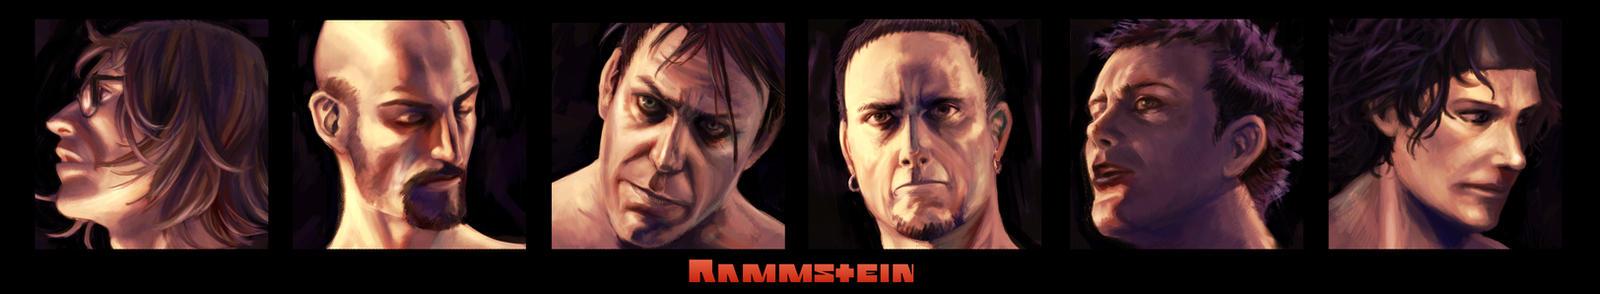 Rammstein by Pojypojy